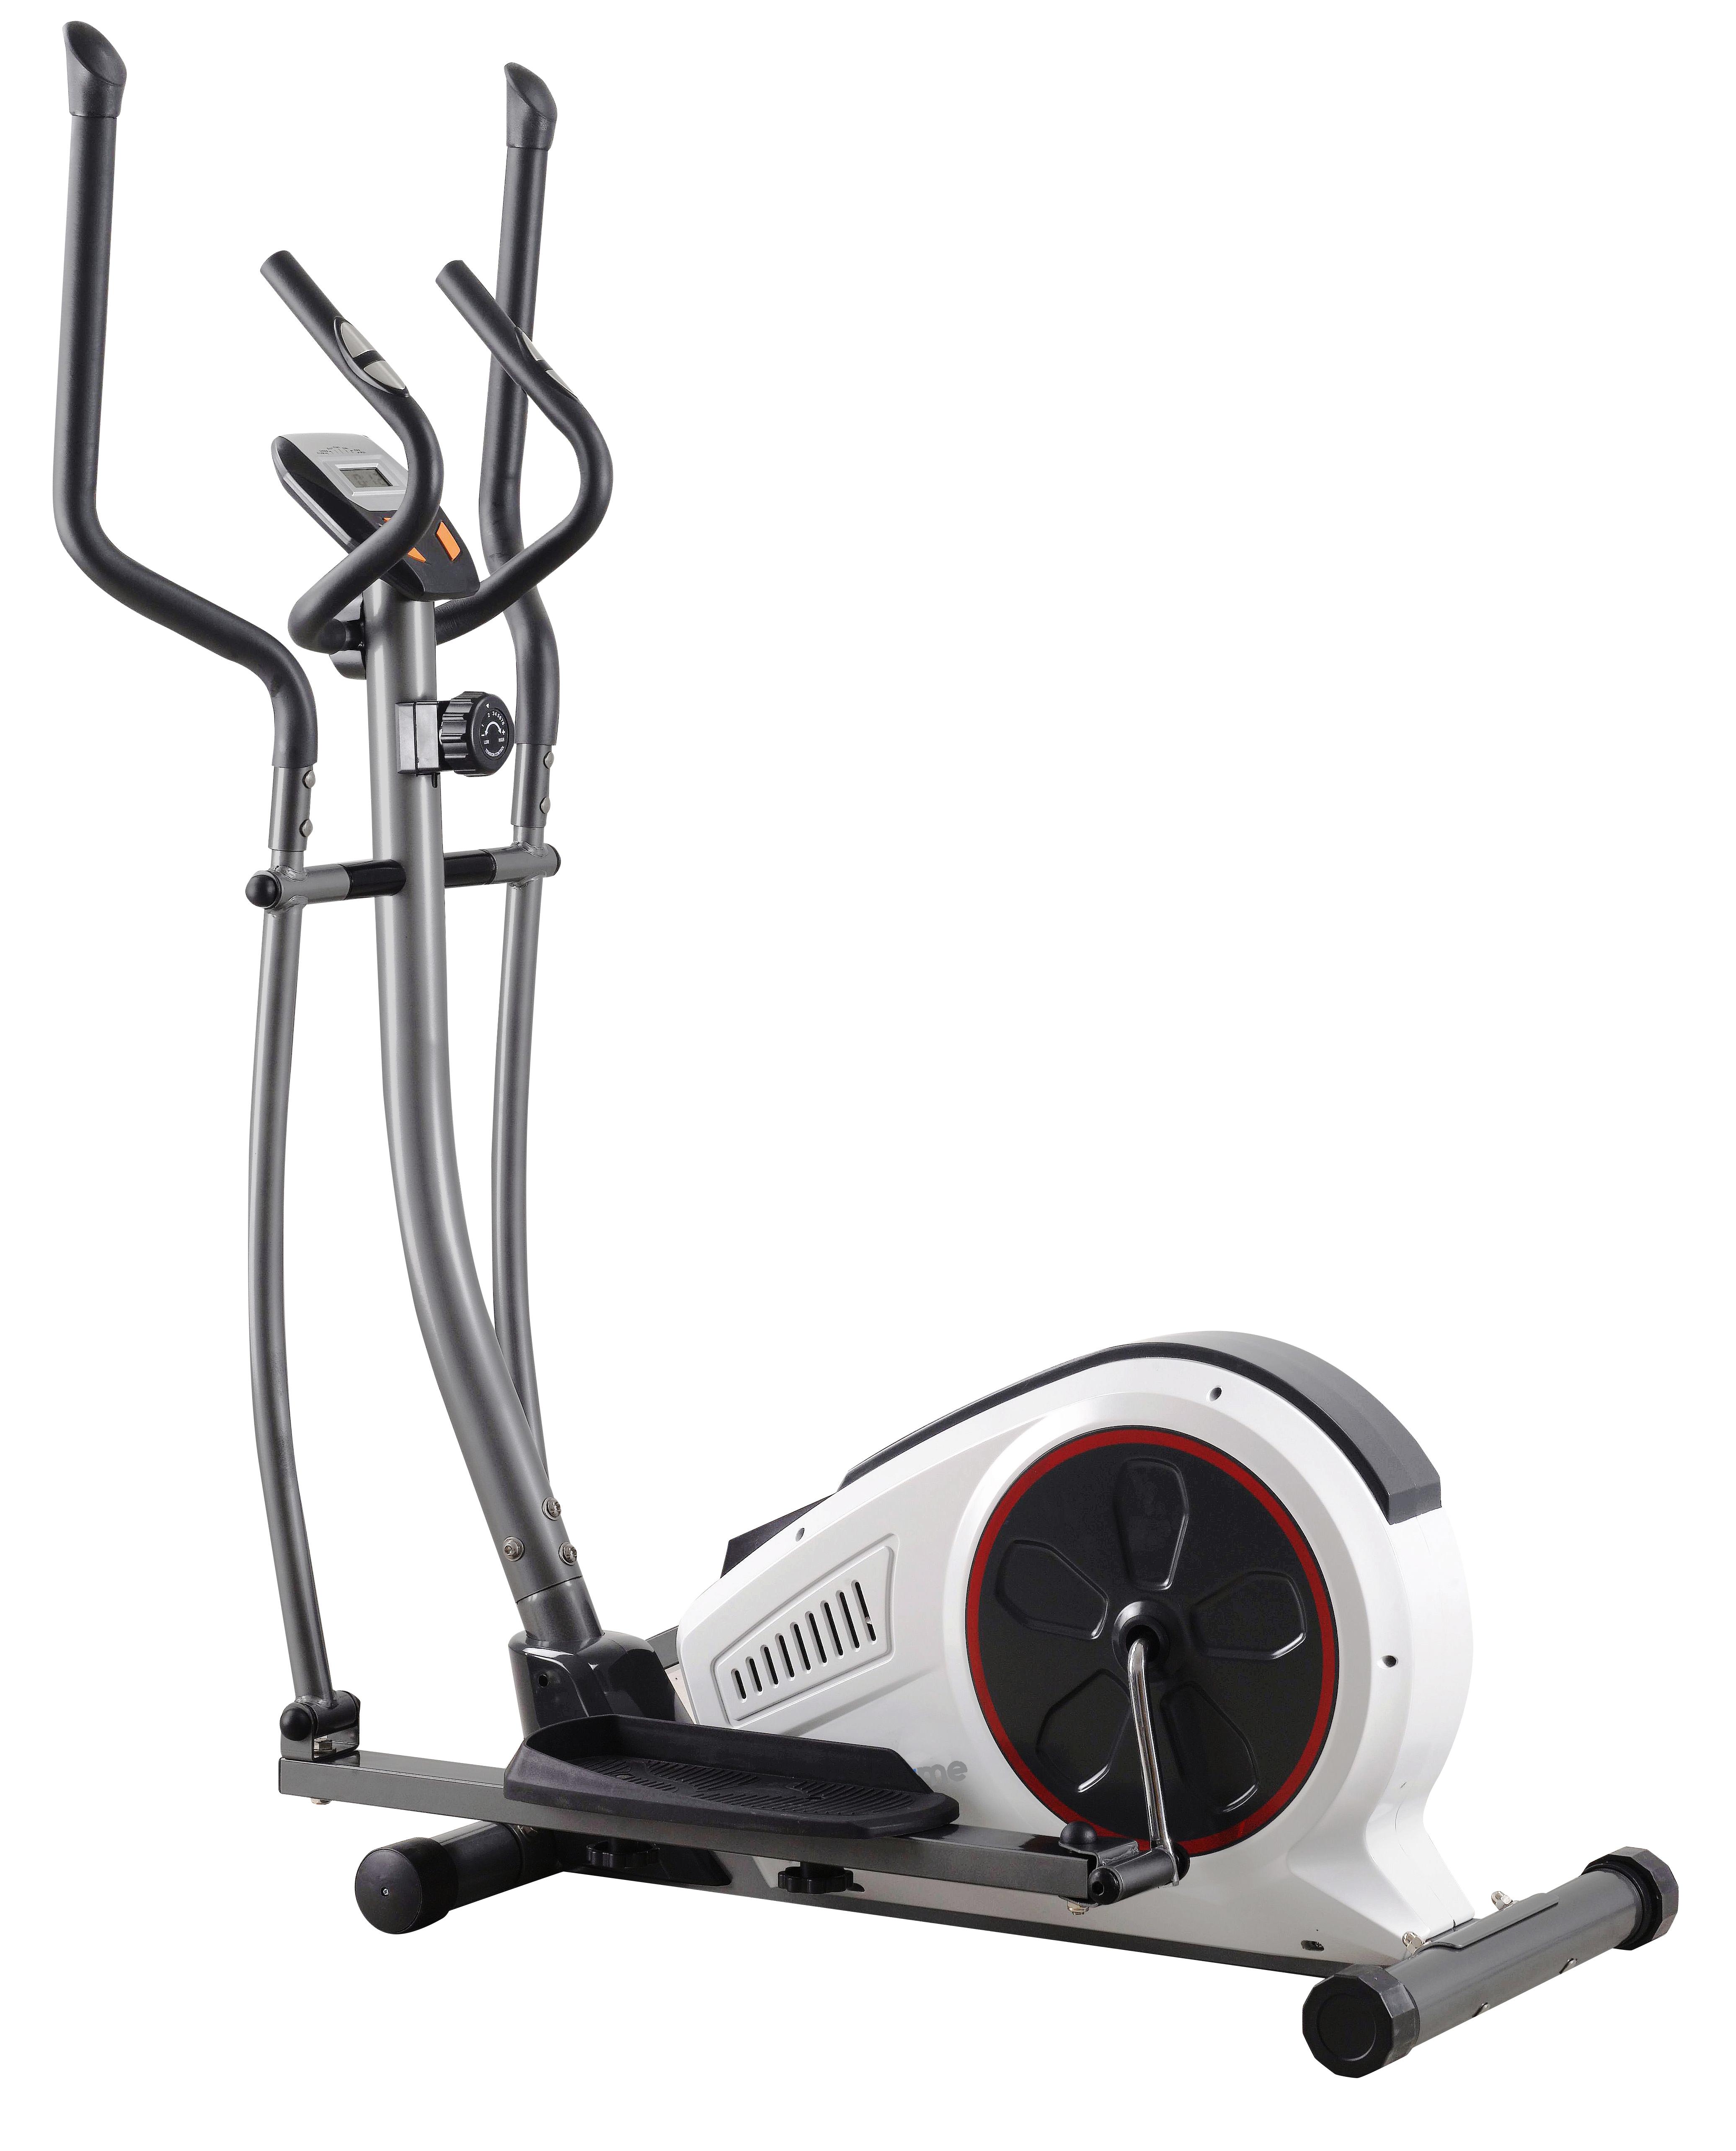 Powerme Crosstrainer , køb din nye Powerme Crosstrainer på www.moreland.dk